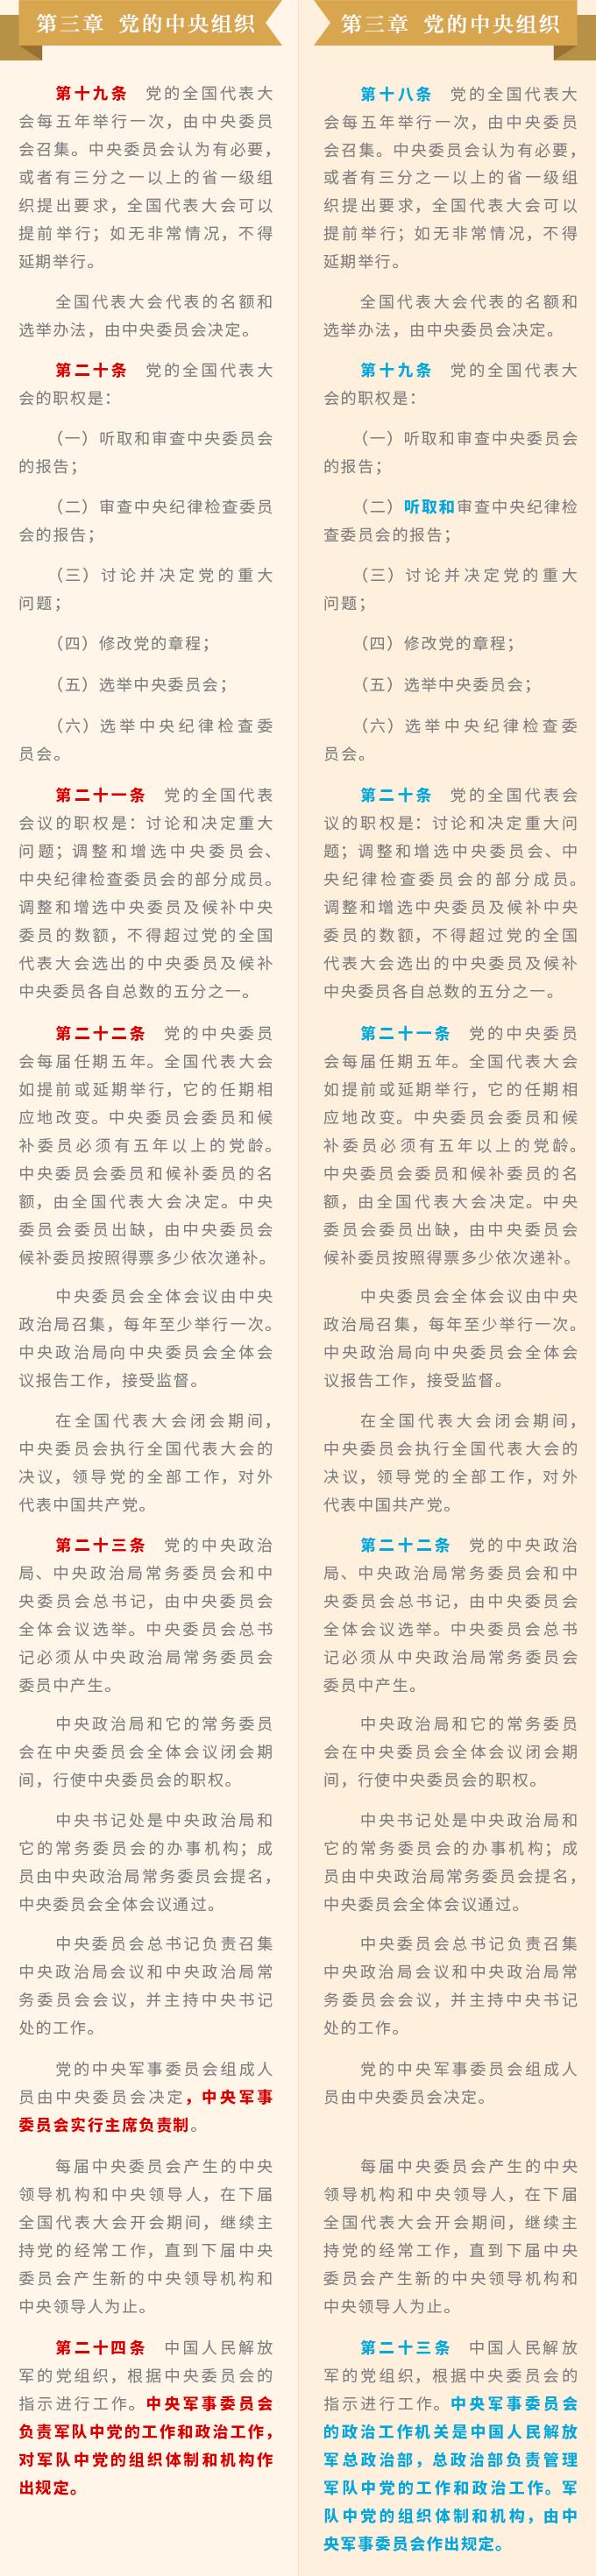 http://www.ccdi.gov.cn/yw/201710/W020171031664657857321.png